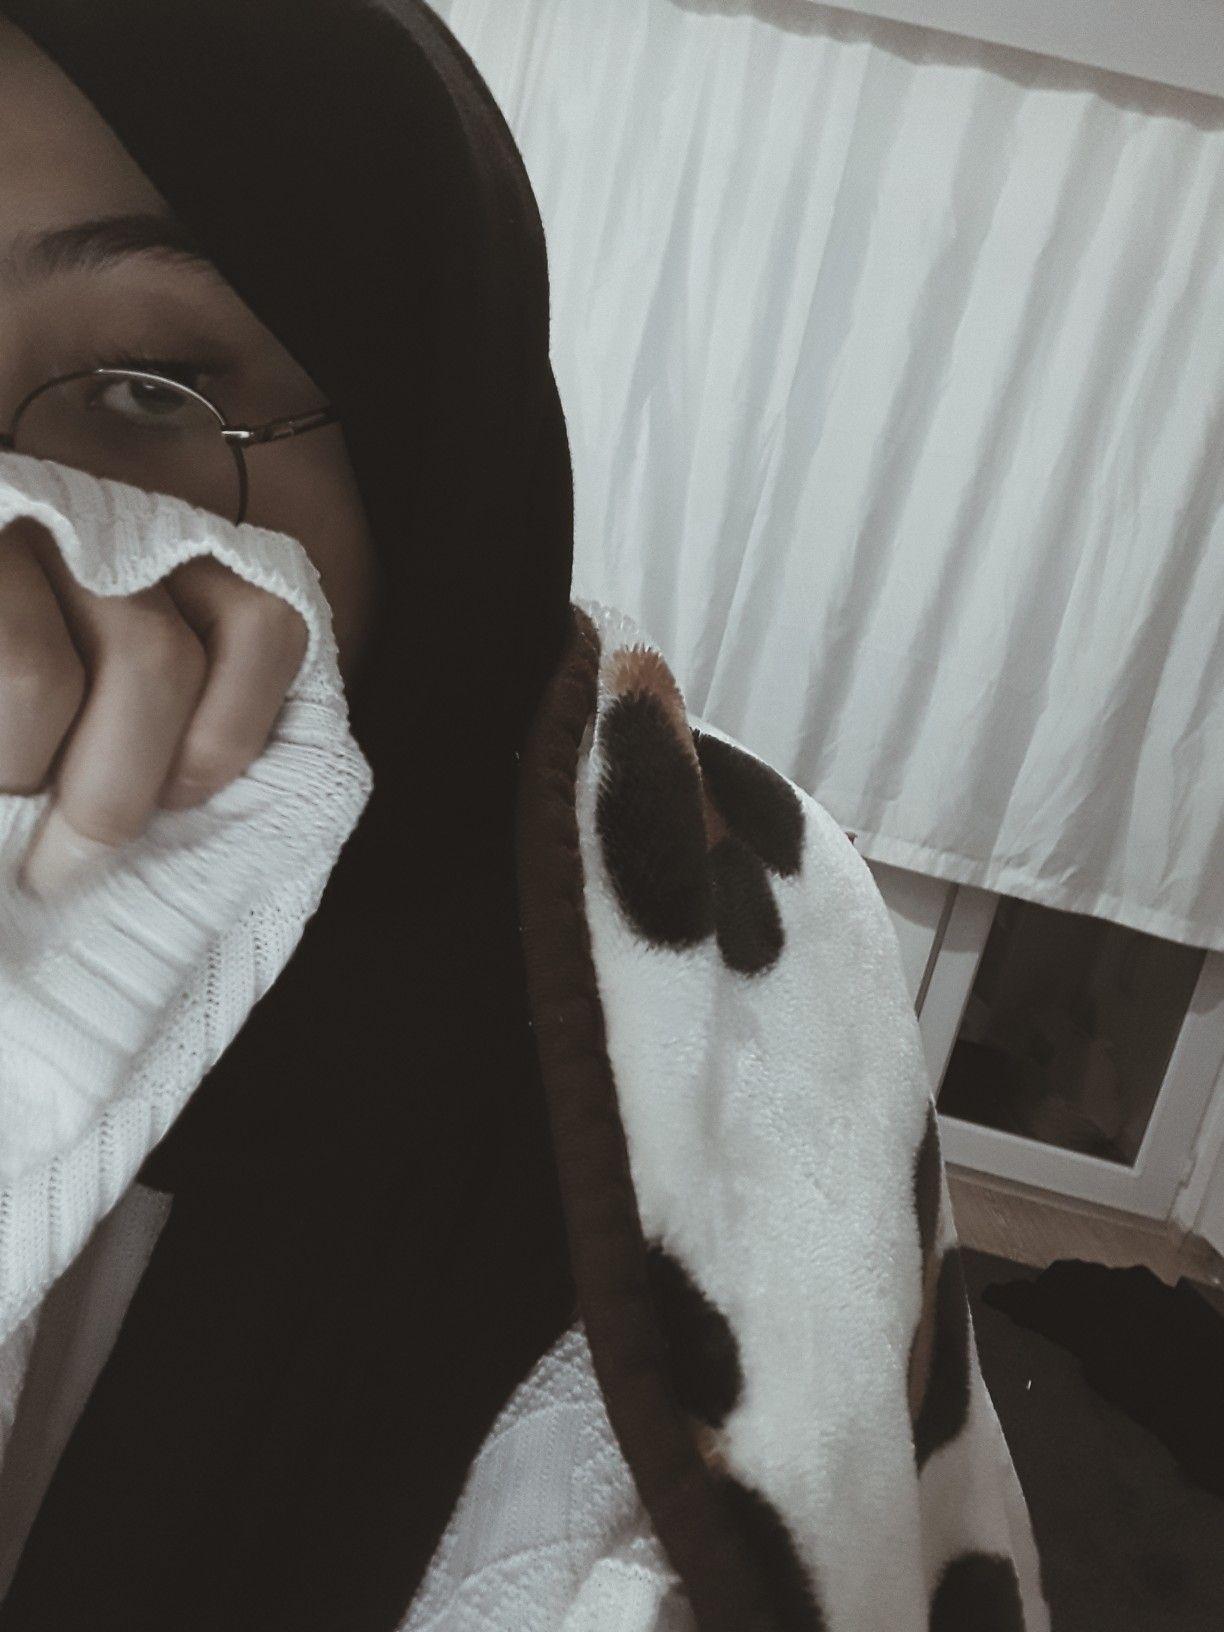 Pin by dhirx on hijab aesthetic in 2019 wanita pakaian fotografi remaja